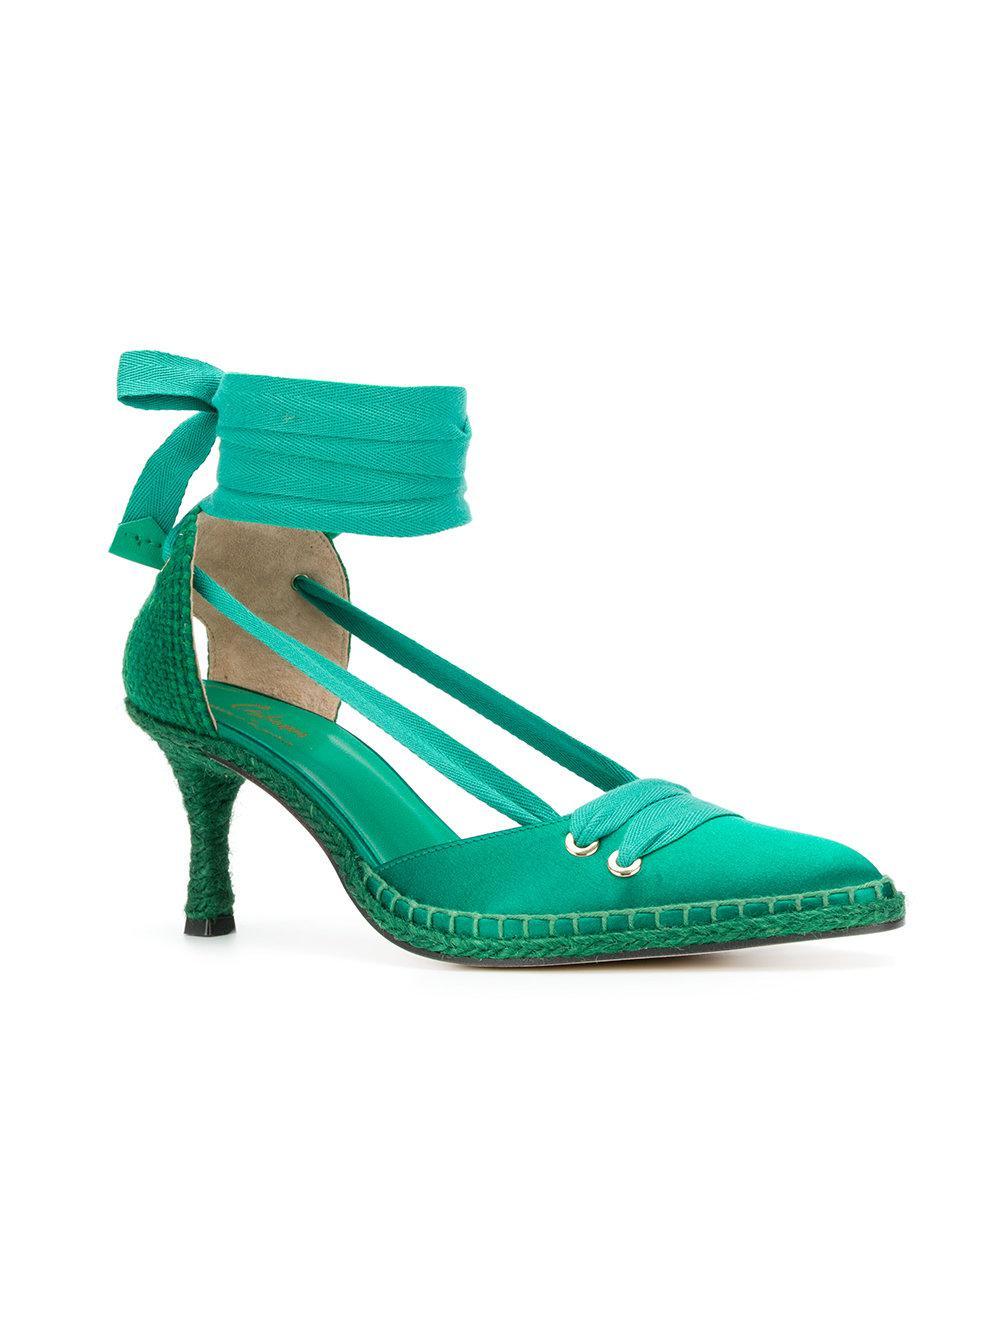 Casta?er x Manolo Blahnik mid-heel espadrille pumps - Green Castaner bVOyrv